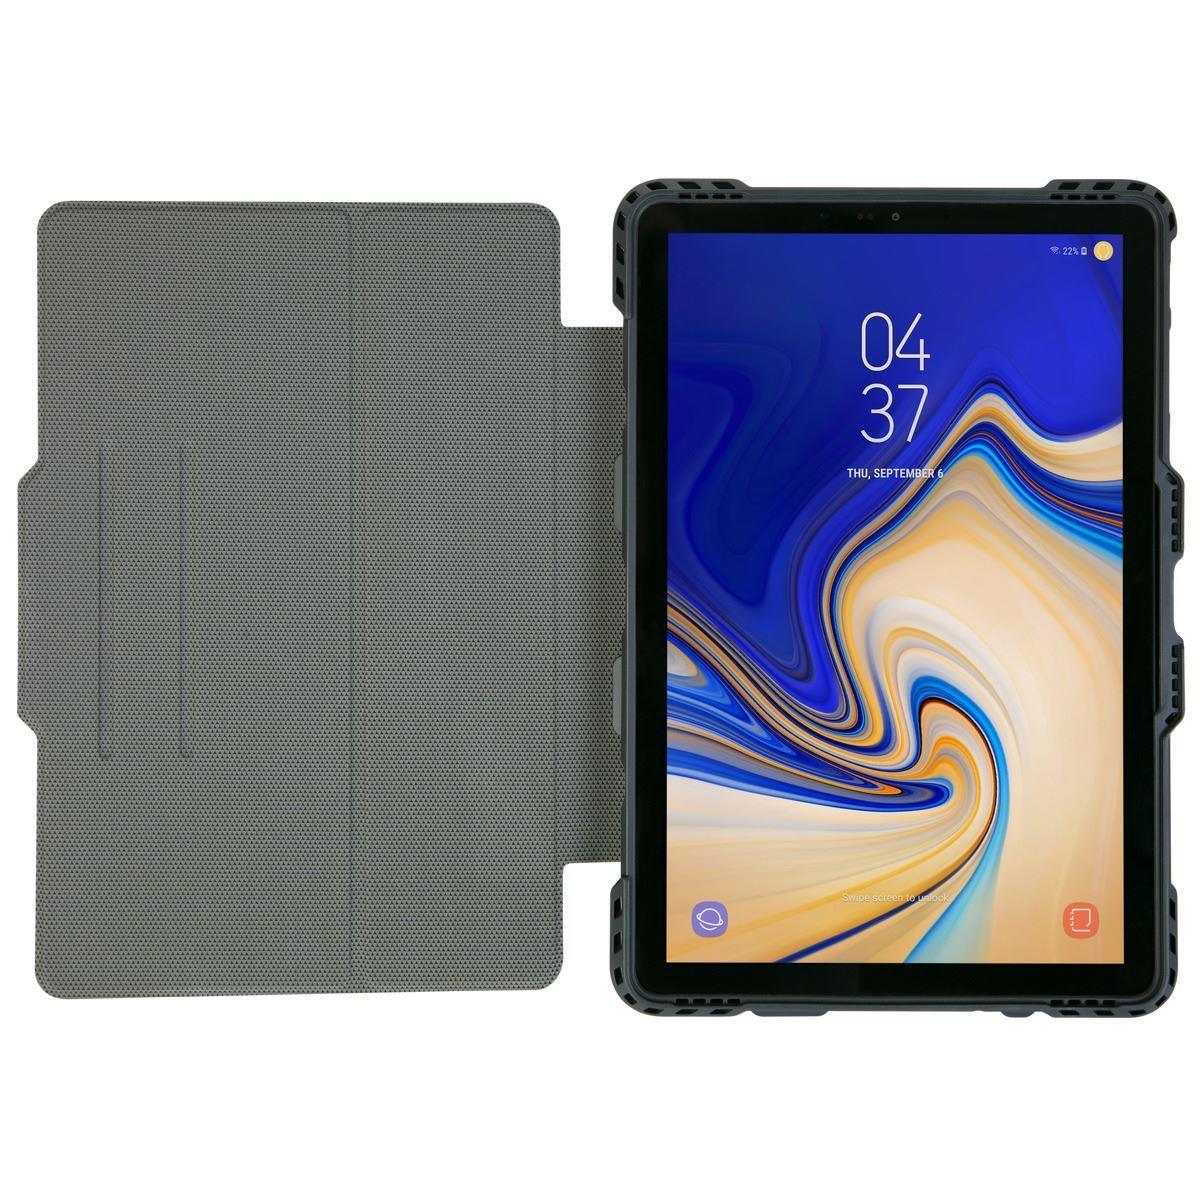 Targus Pro-Tek Rotating Case (Black) for Samsung Galaxy Tab S4 (10.5 inch)